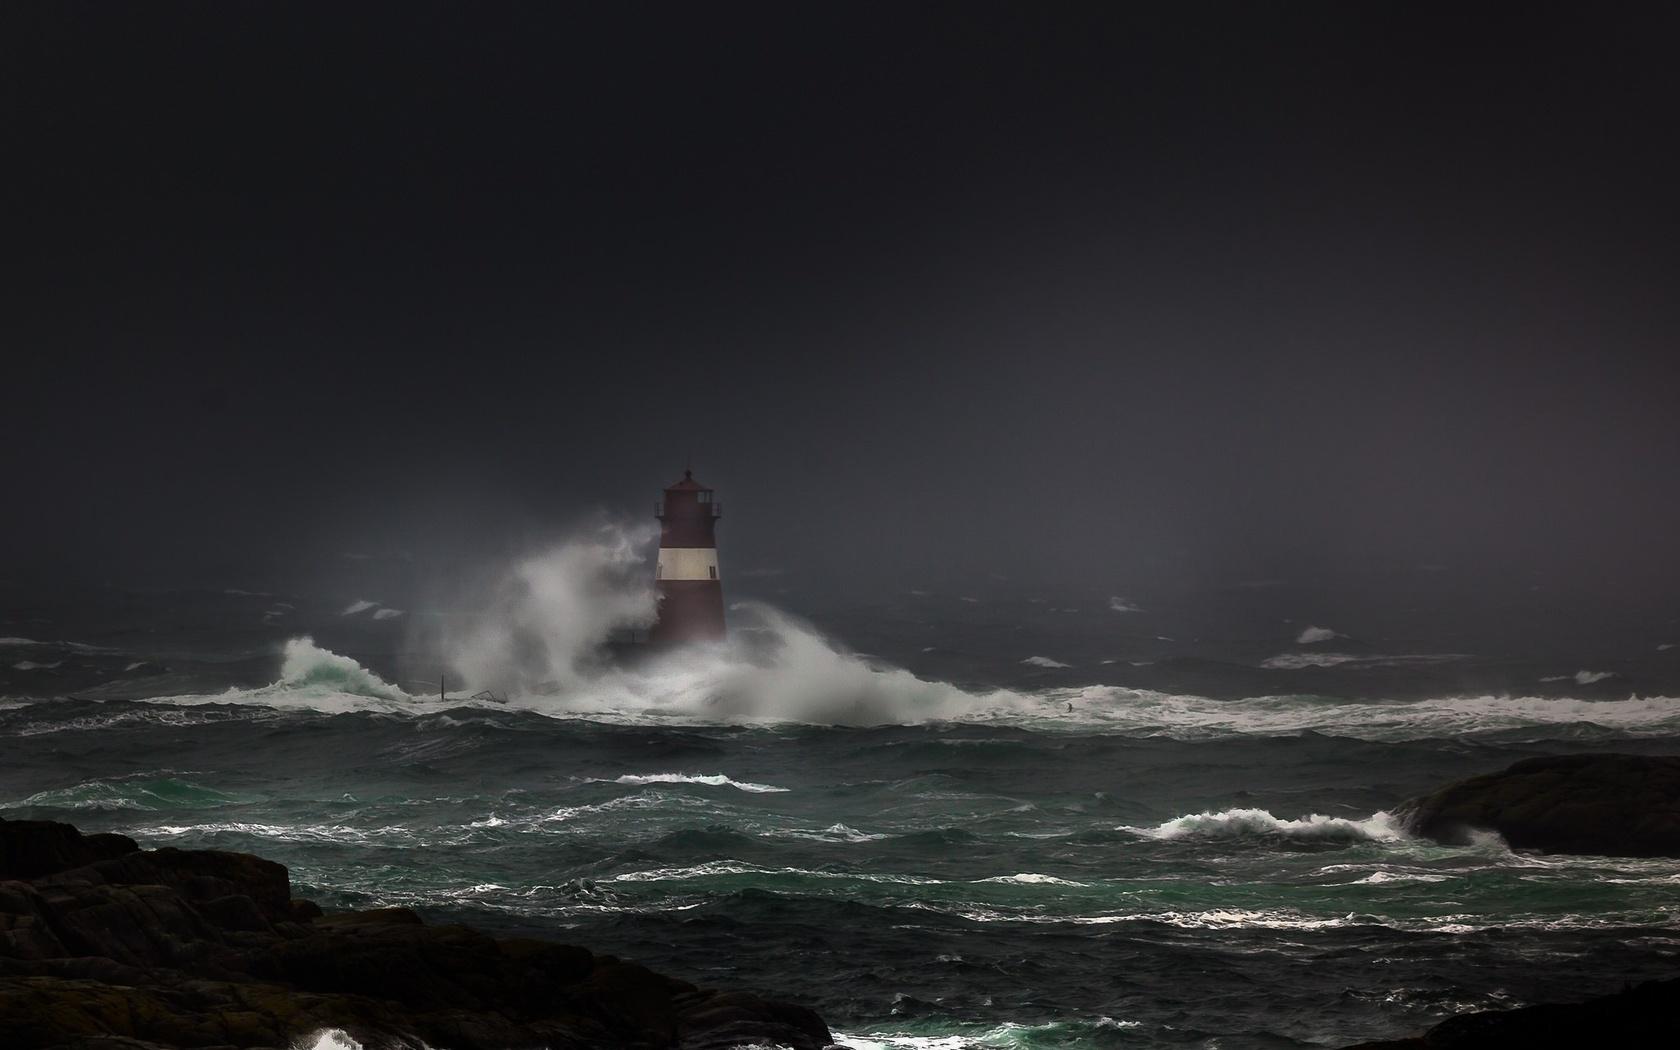 океан, маяк, шторм, циклон, волны, пасмурно, красиво, скалы, камни, темный фон, небо, природа